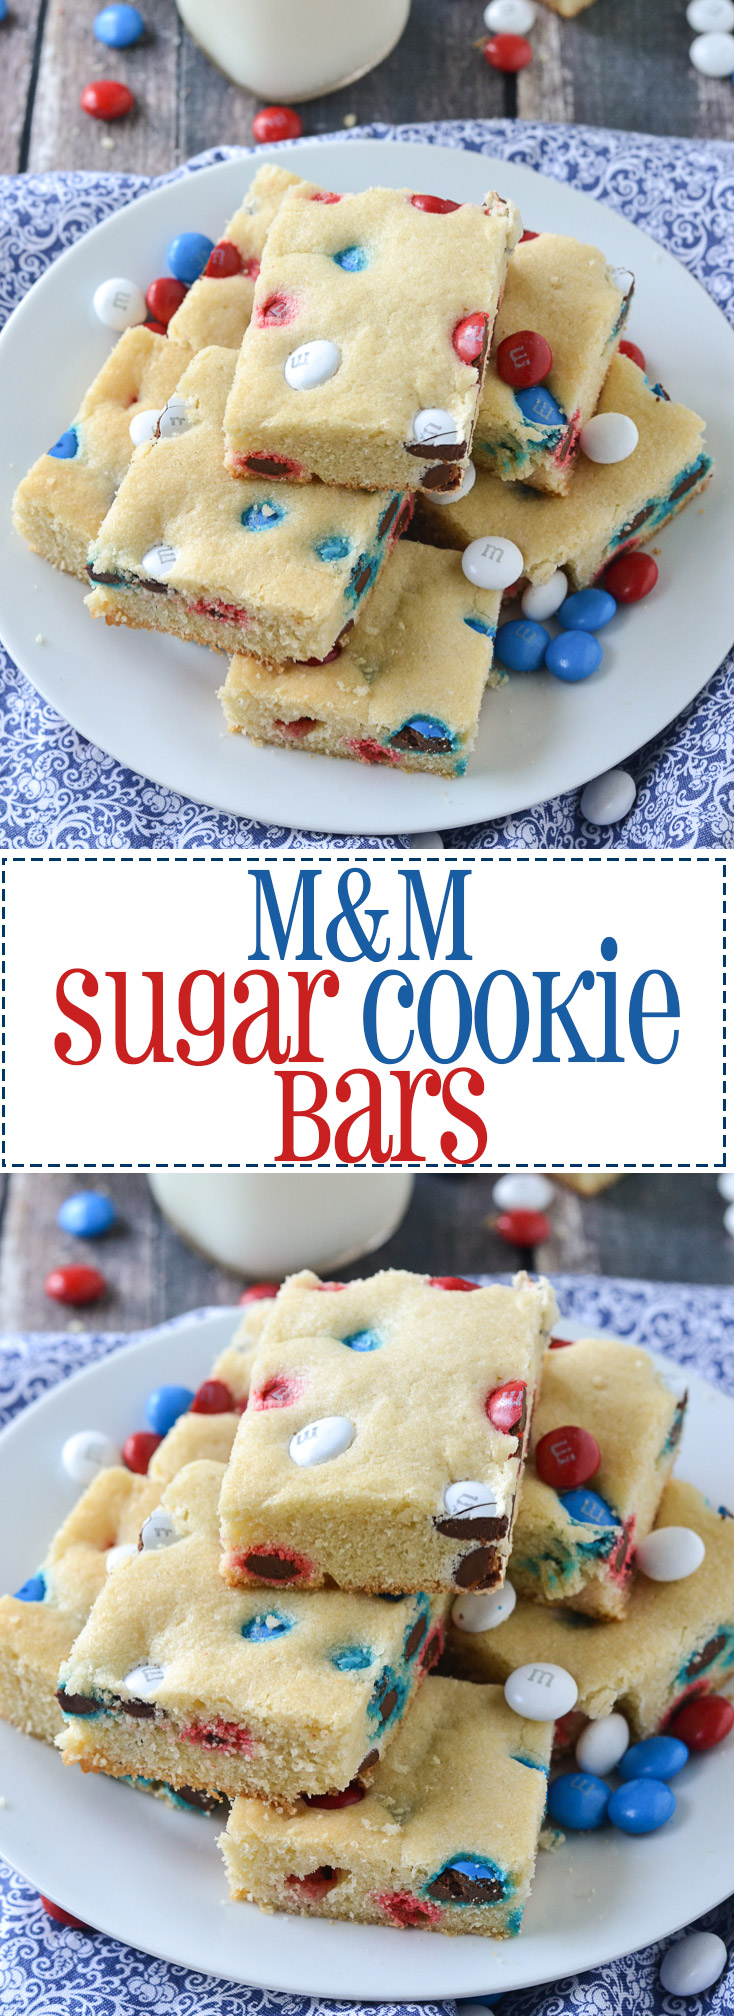 M&M Sugar Cookie Bars | www.motherthyme.com